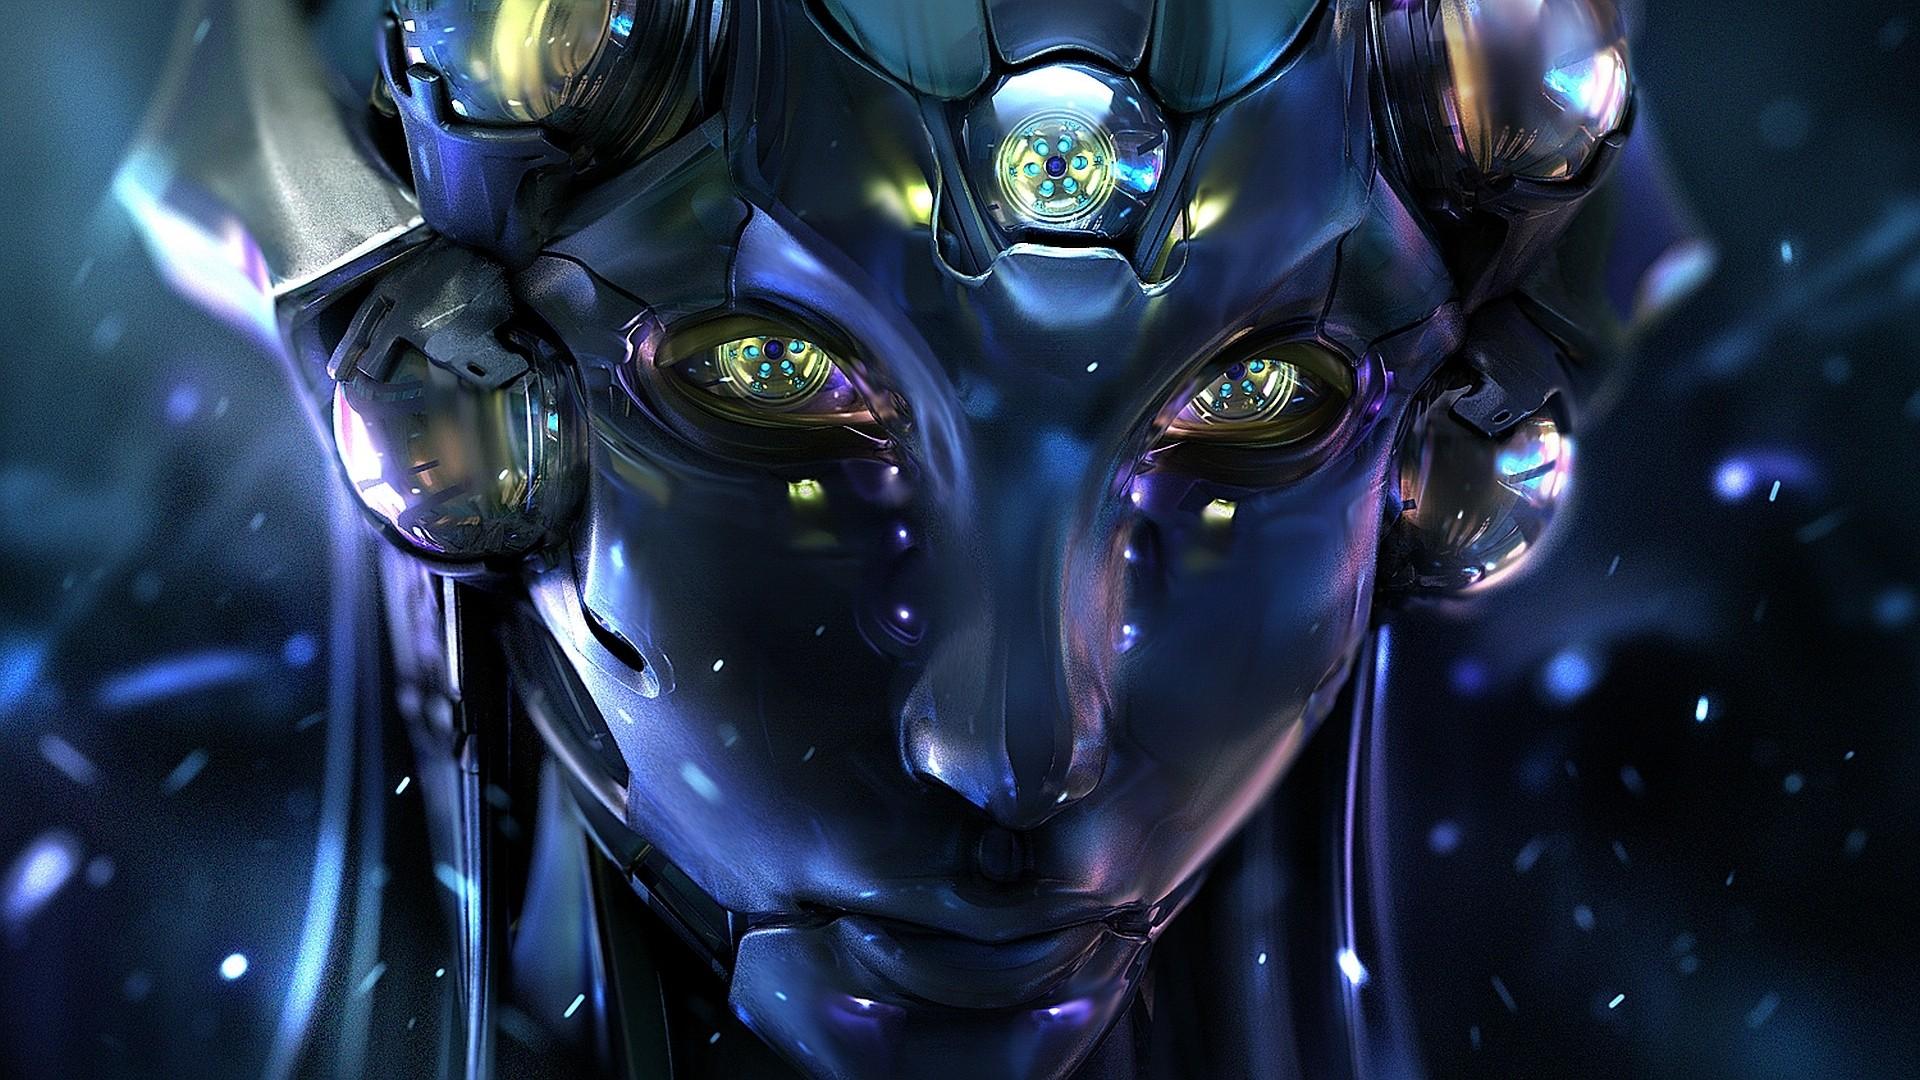 Cyborg Wallpaper Free Download